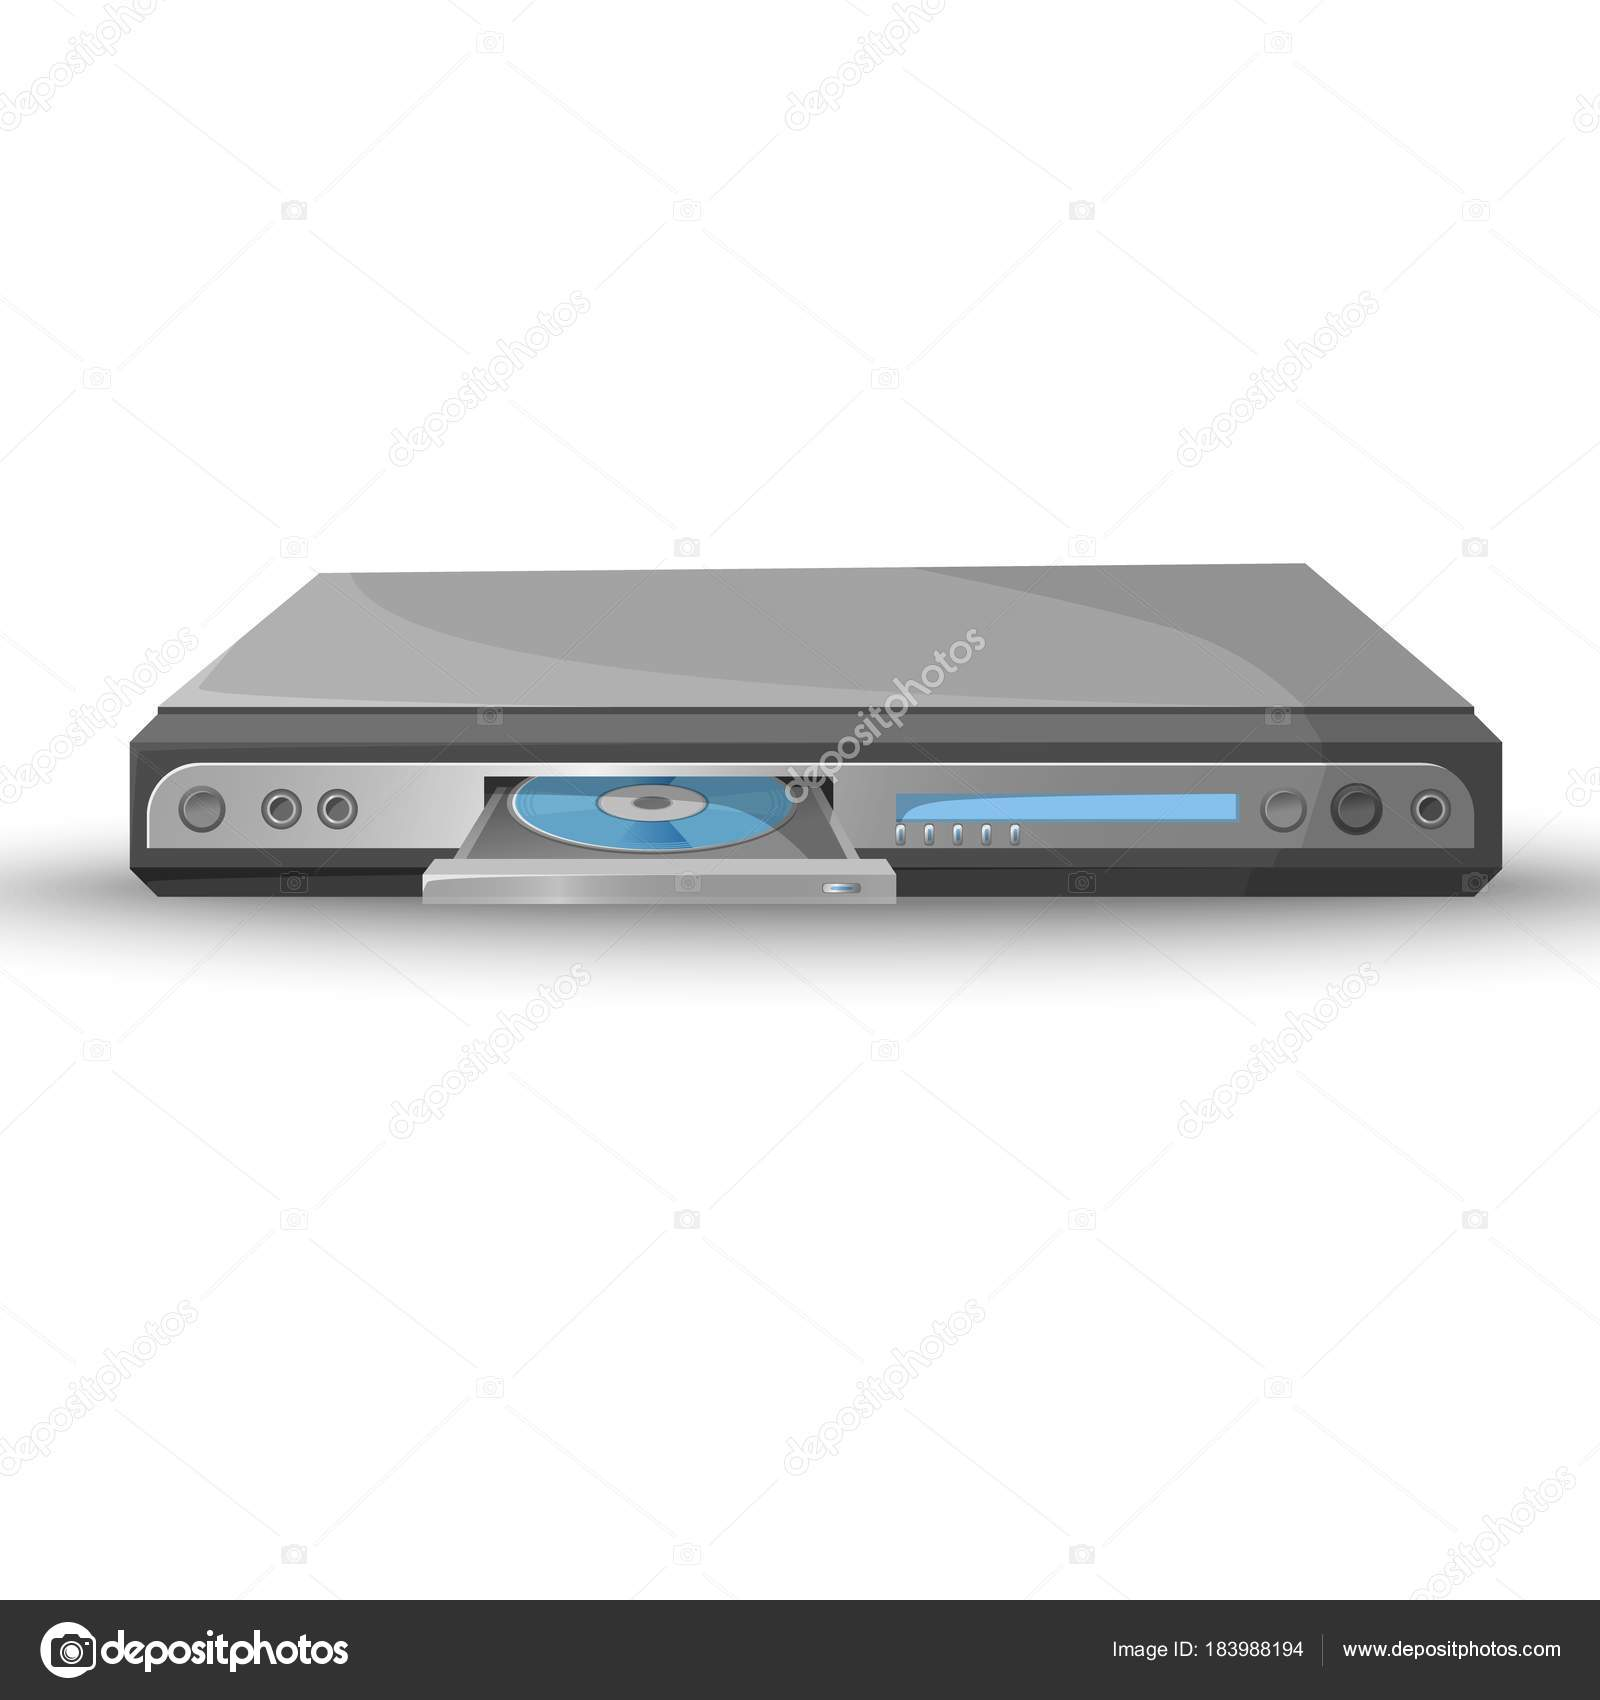 5 best dvd player software download free on windows/mac.